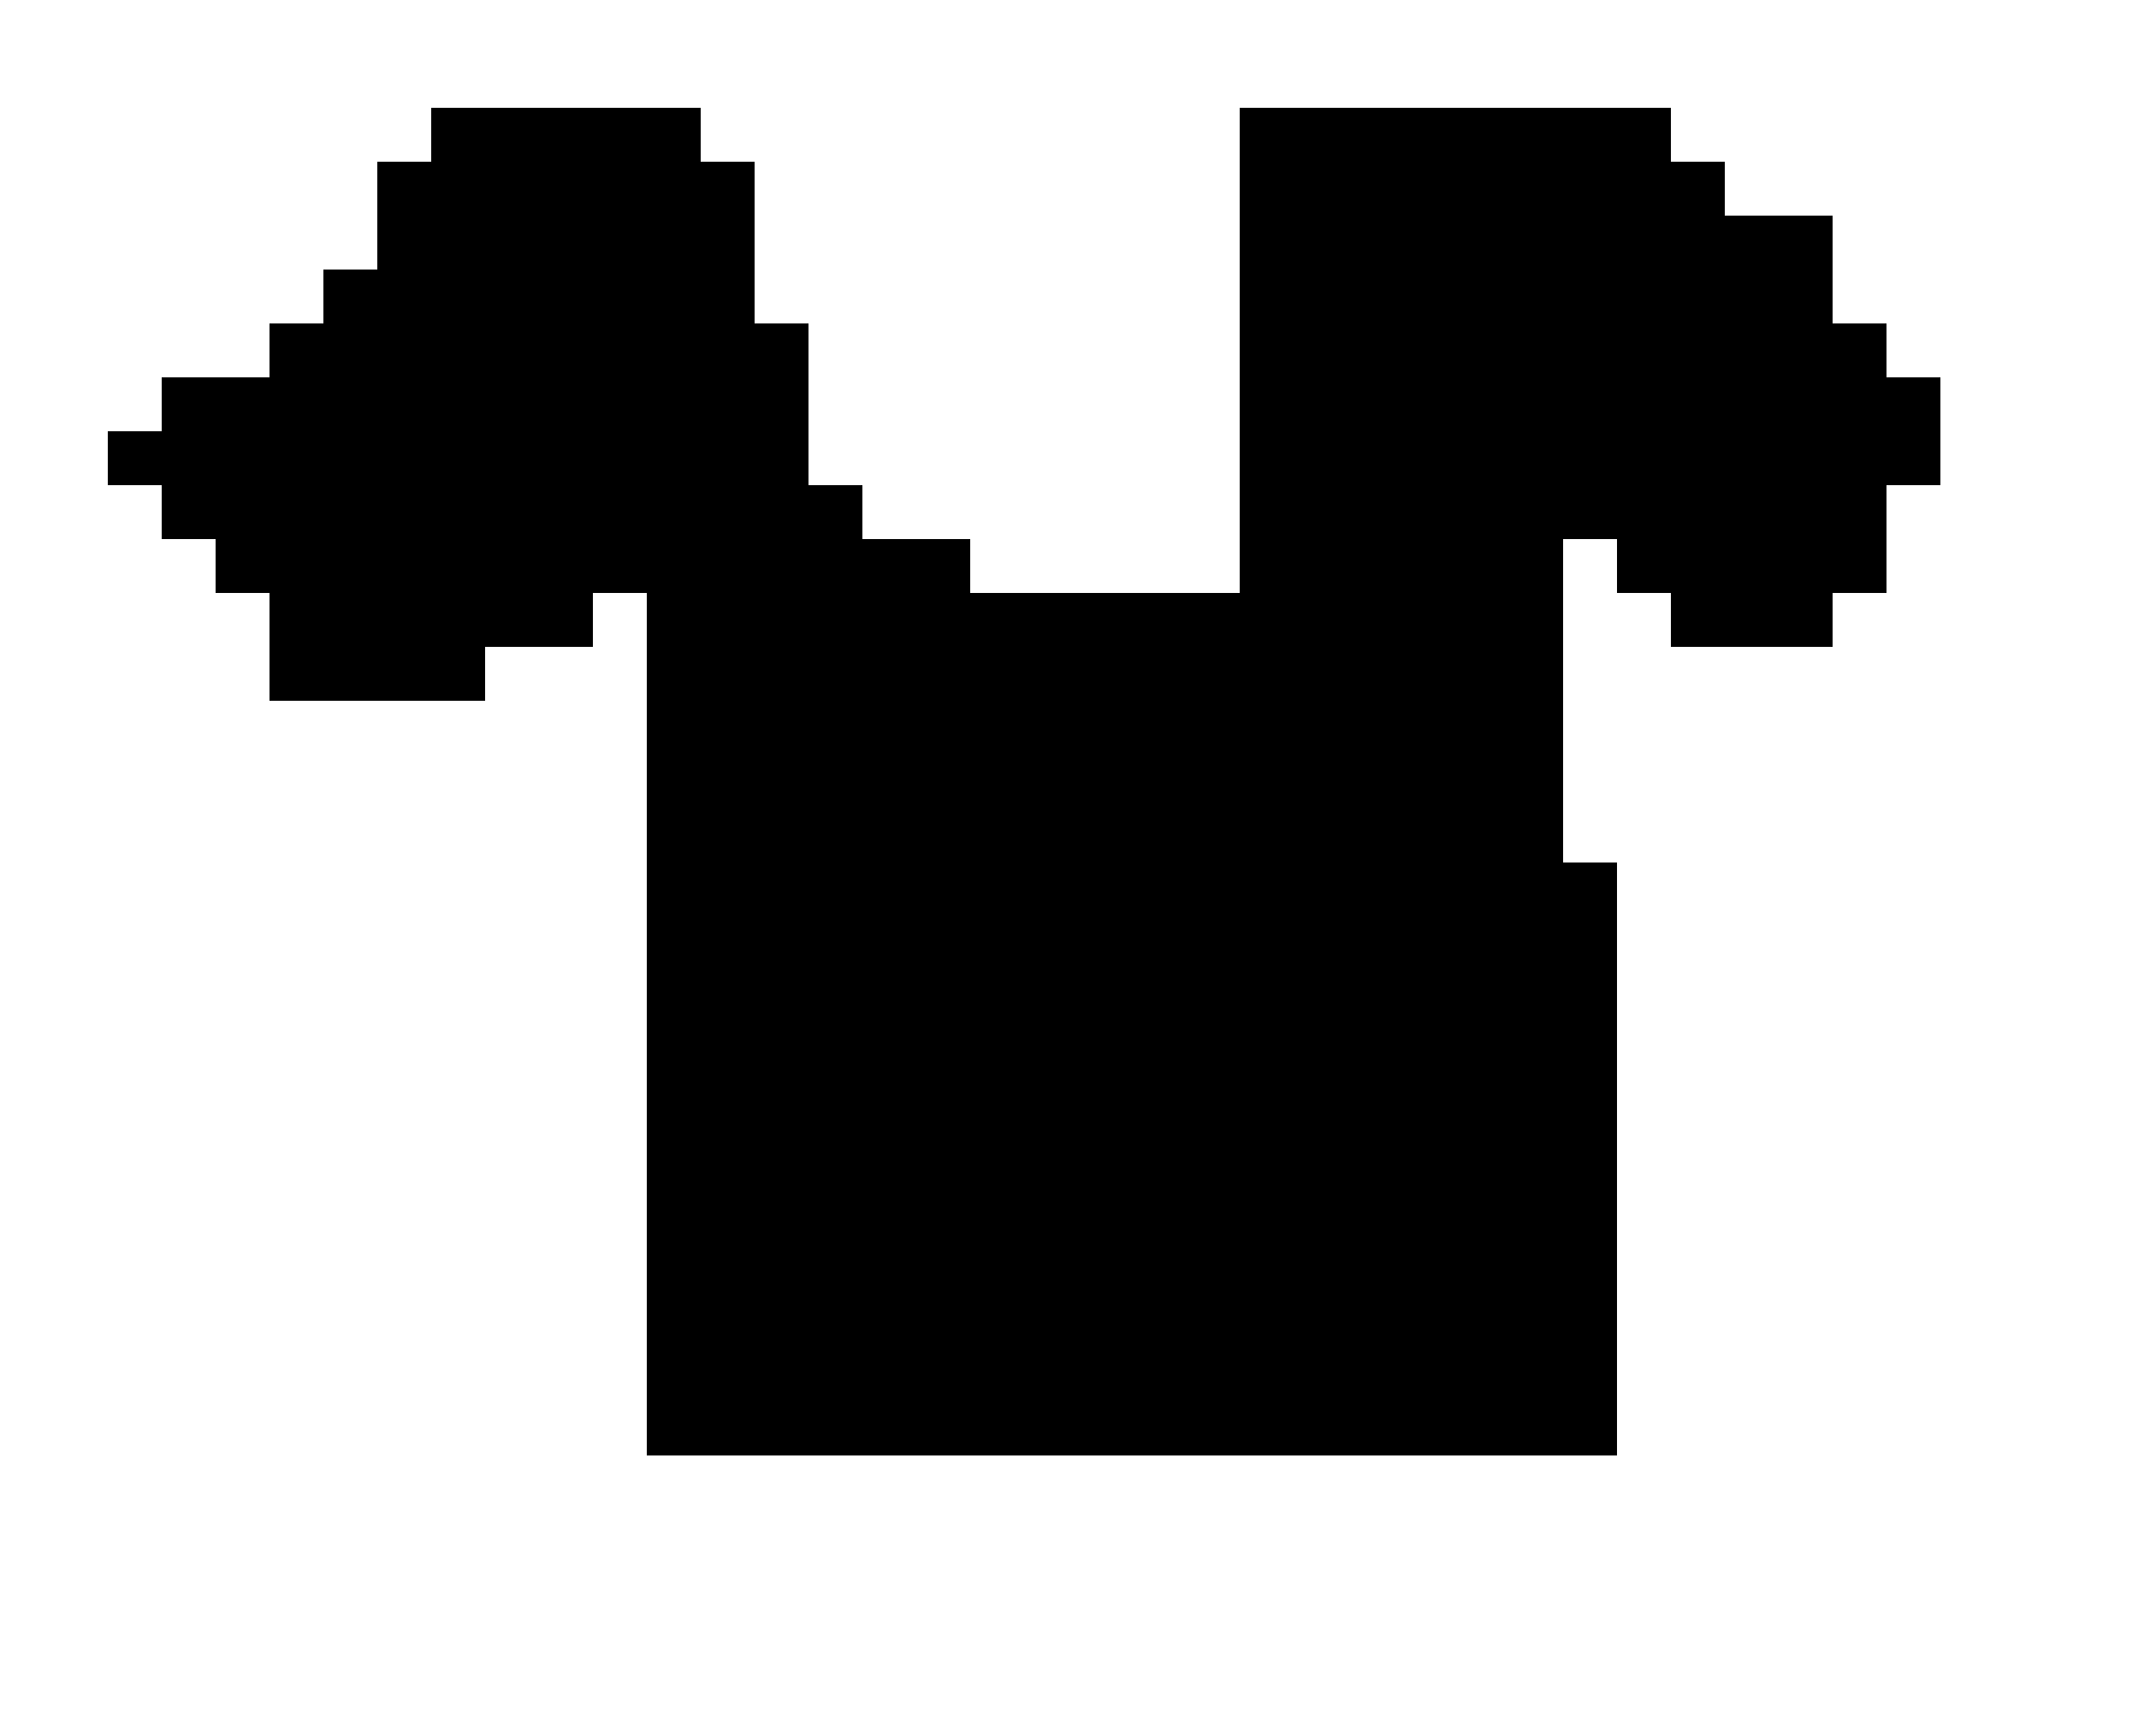 64x64 | Pixel Art Maker